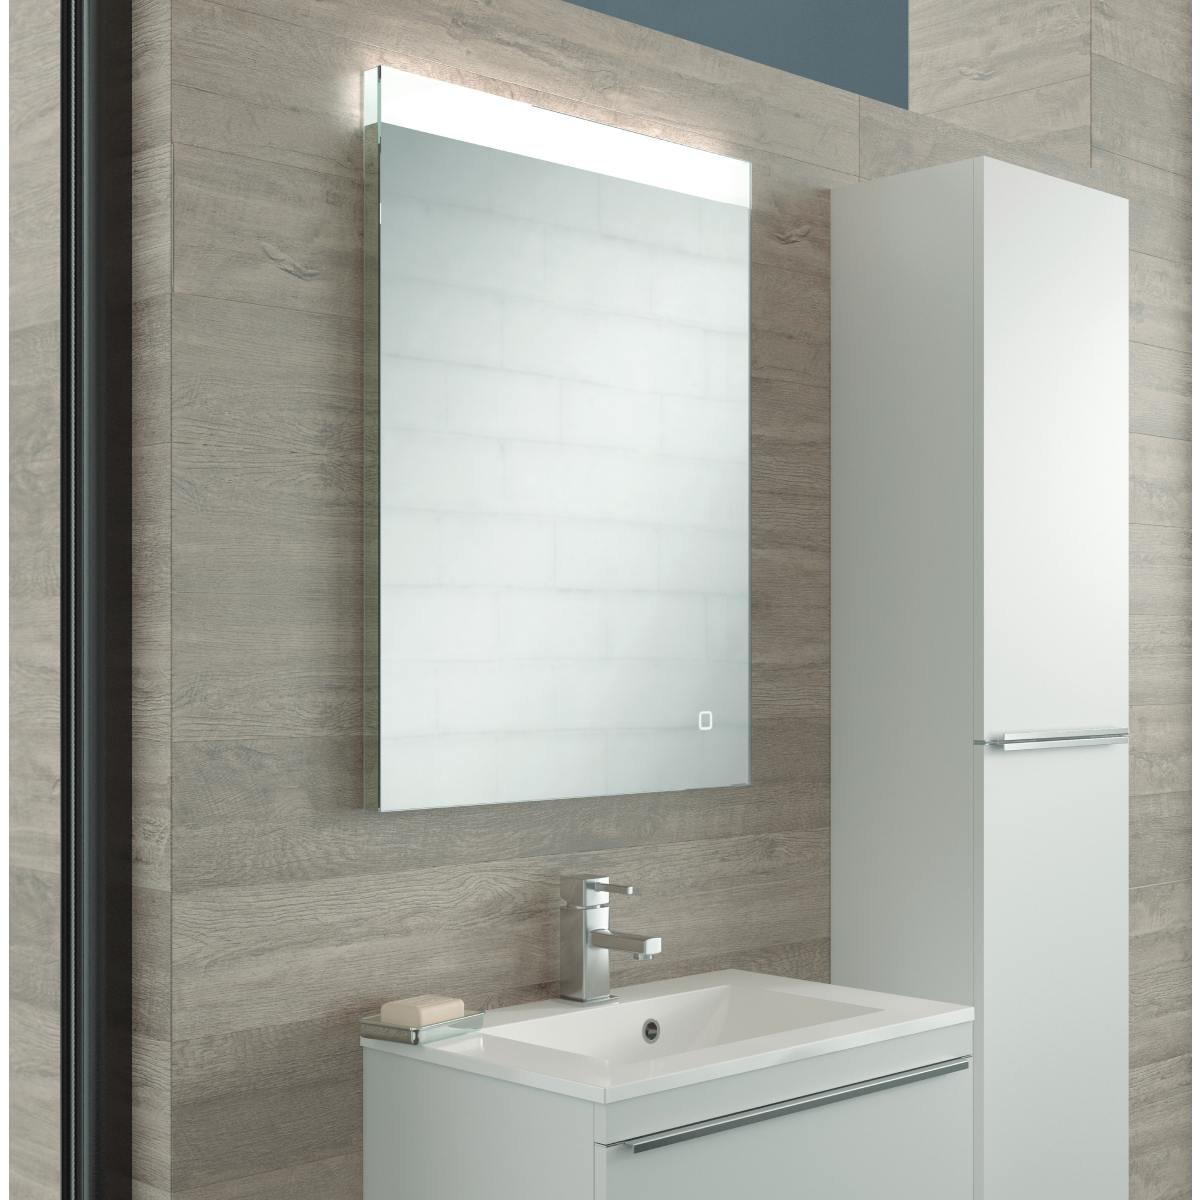 HIB Ambience 60 LED Steam Free Bathroom Mirror | 79200000